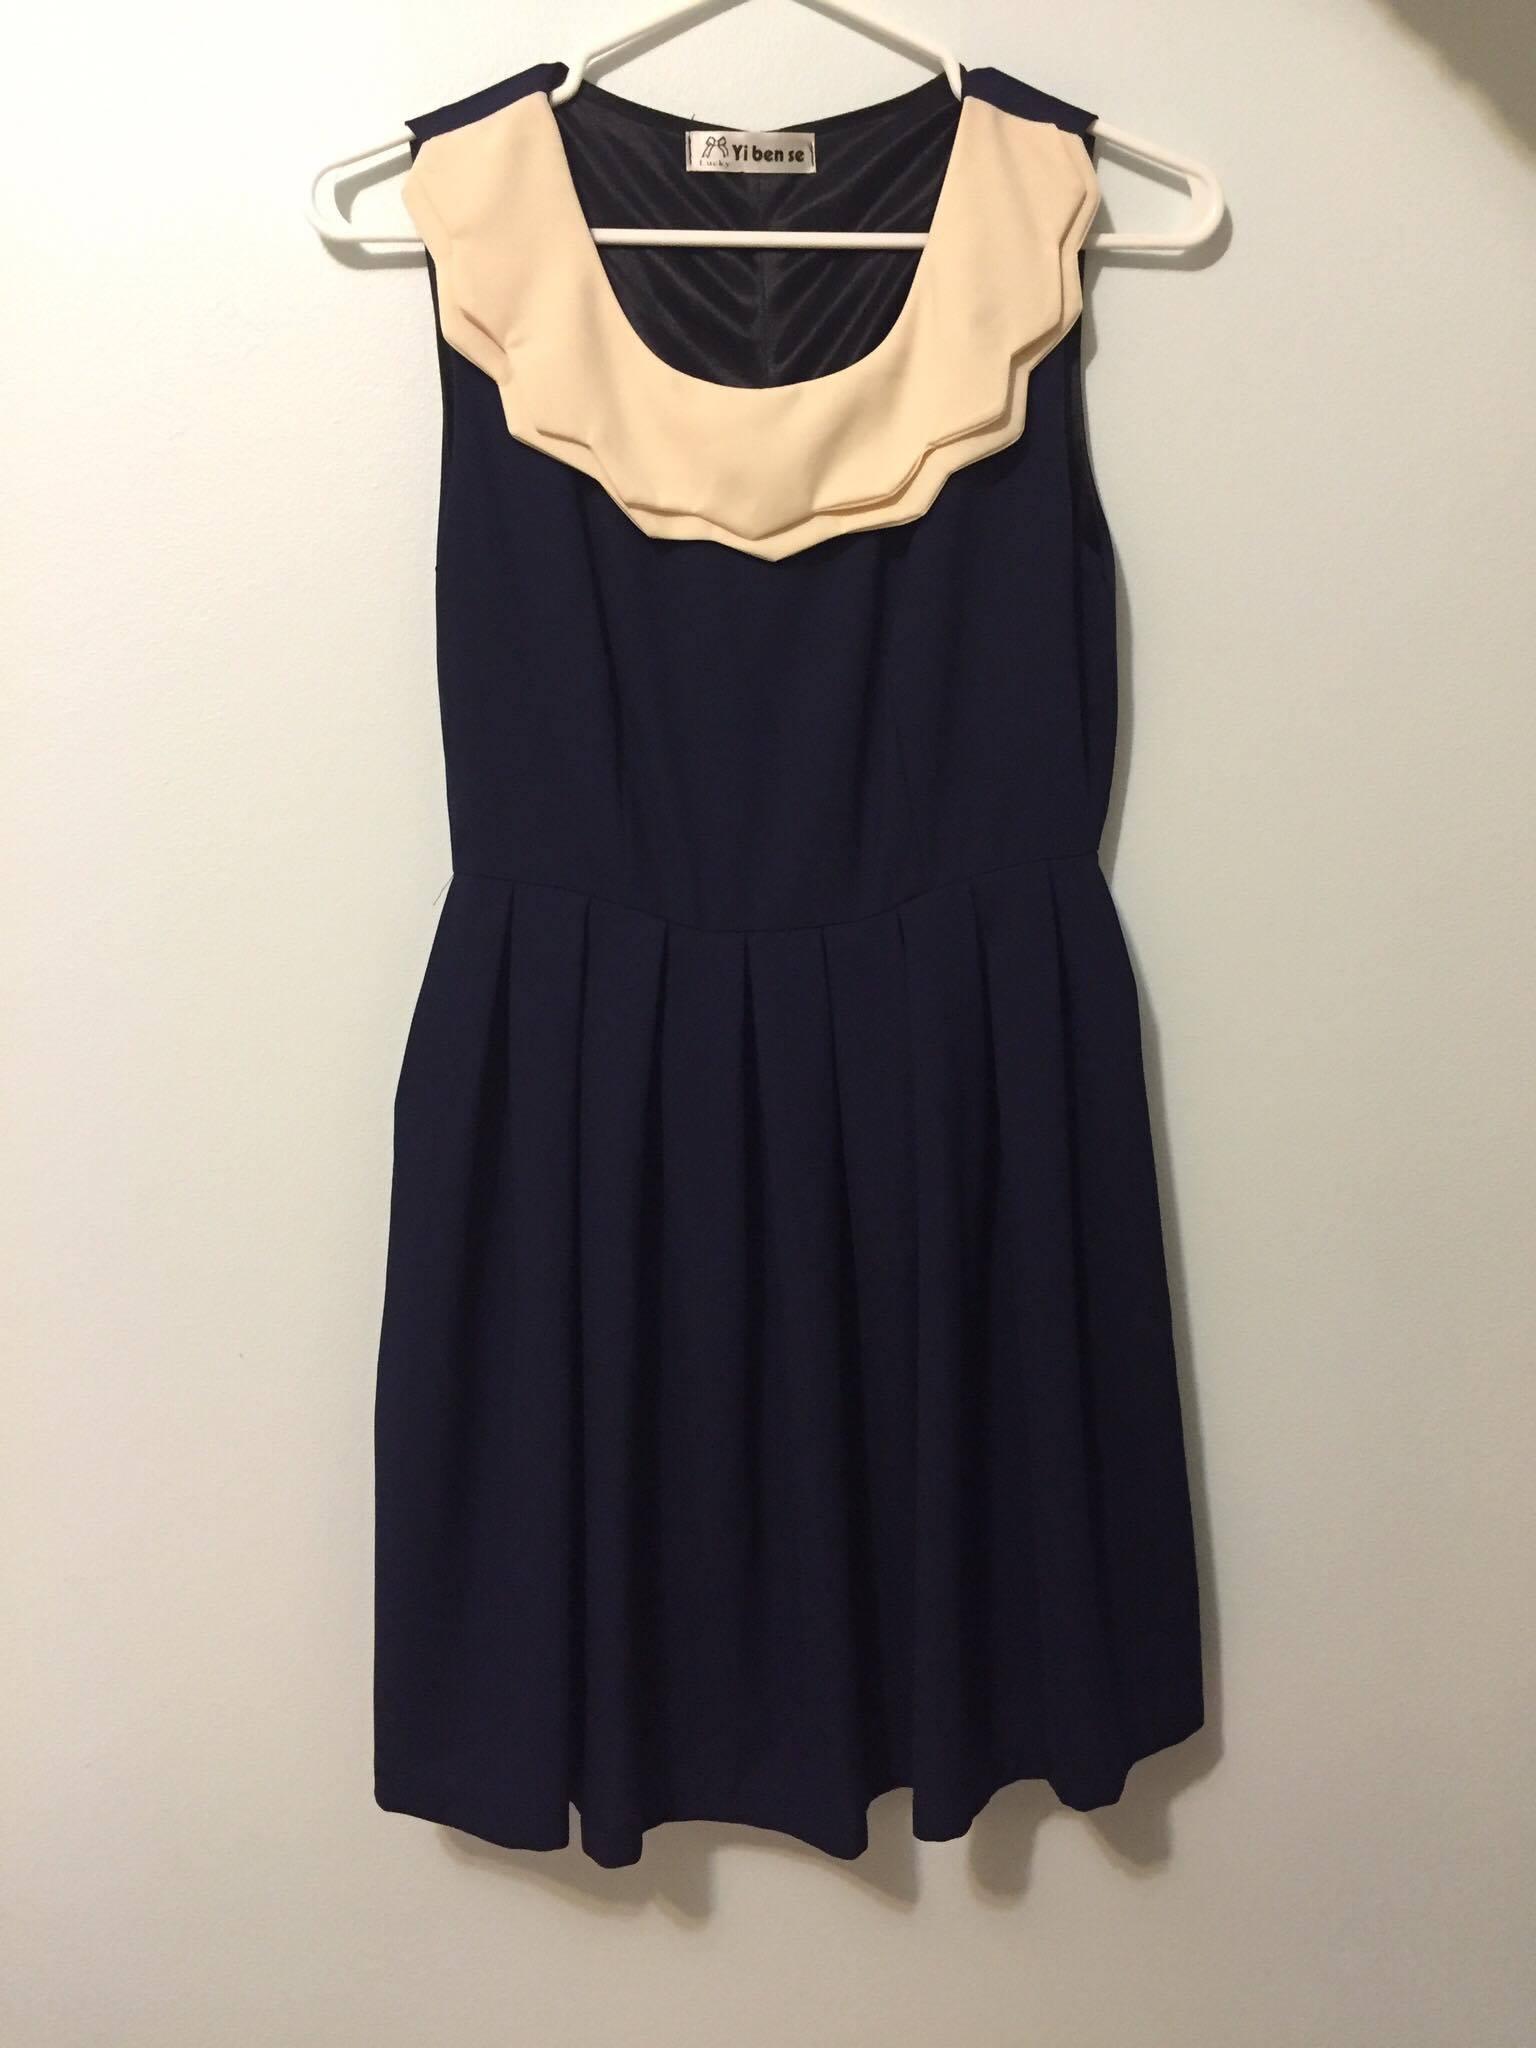 Navy blue dress with cream collar